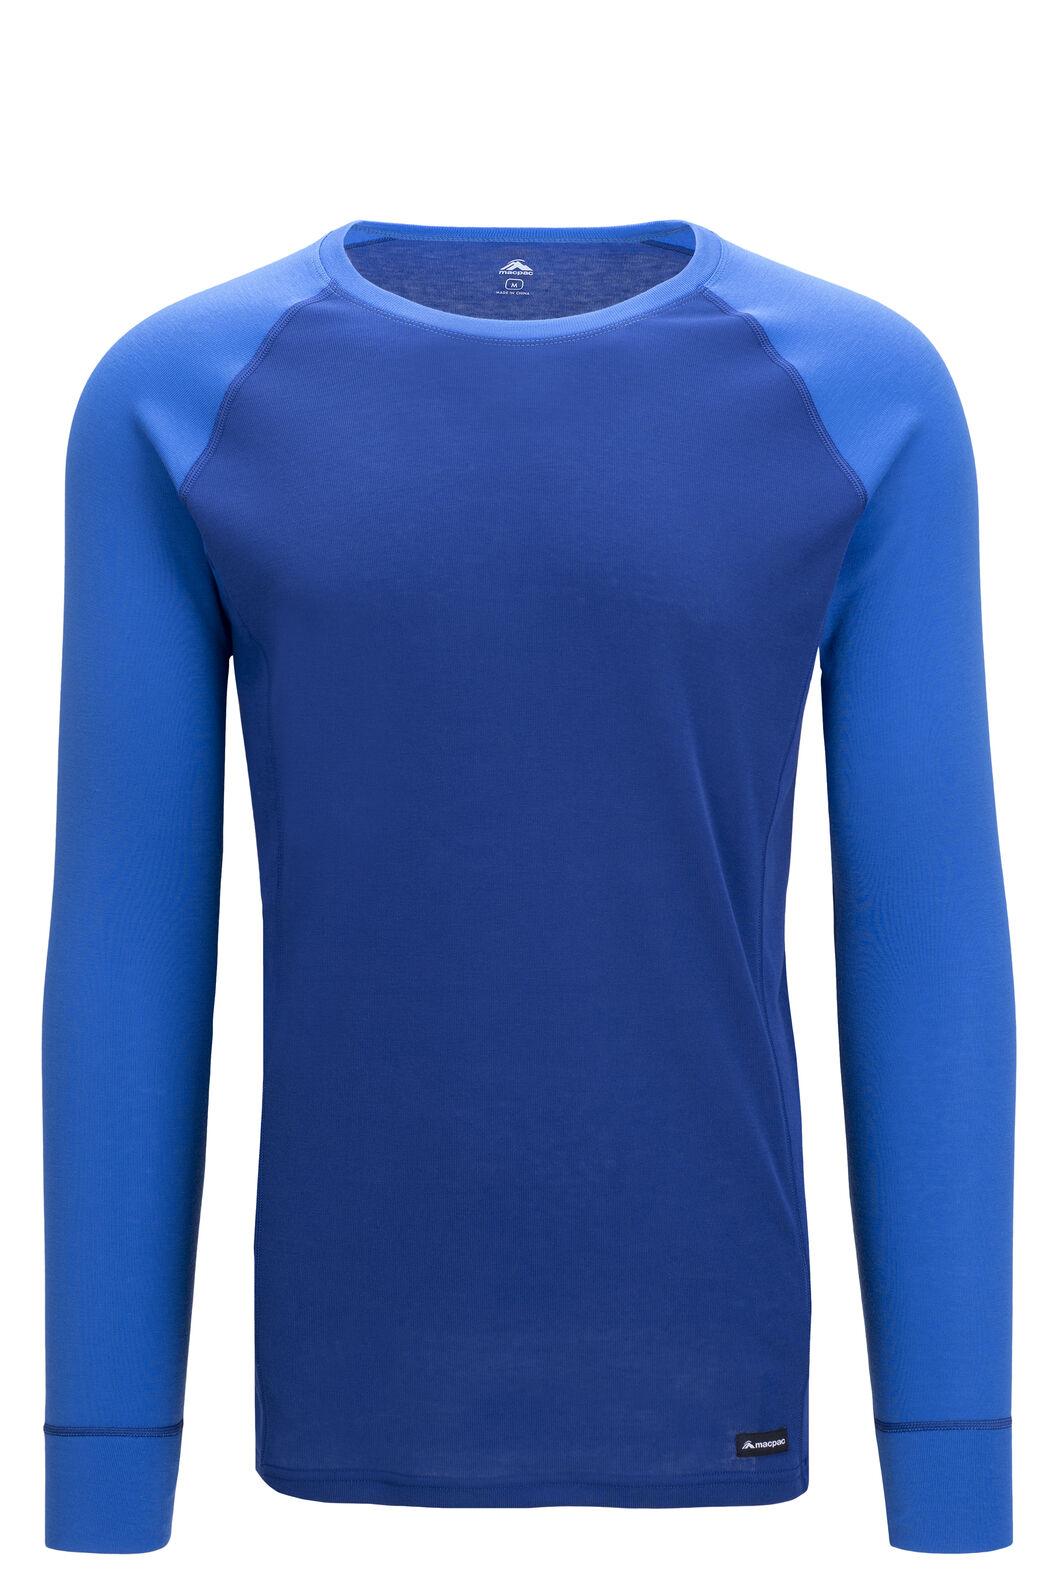 Macpac Geothermal Long Sleeve Top — Men's, Sodalite Blue/Strong Blue, hi-res